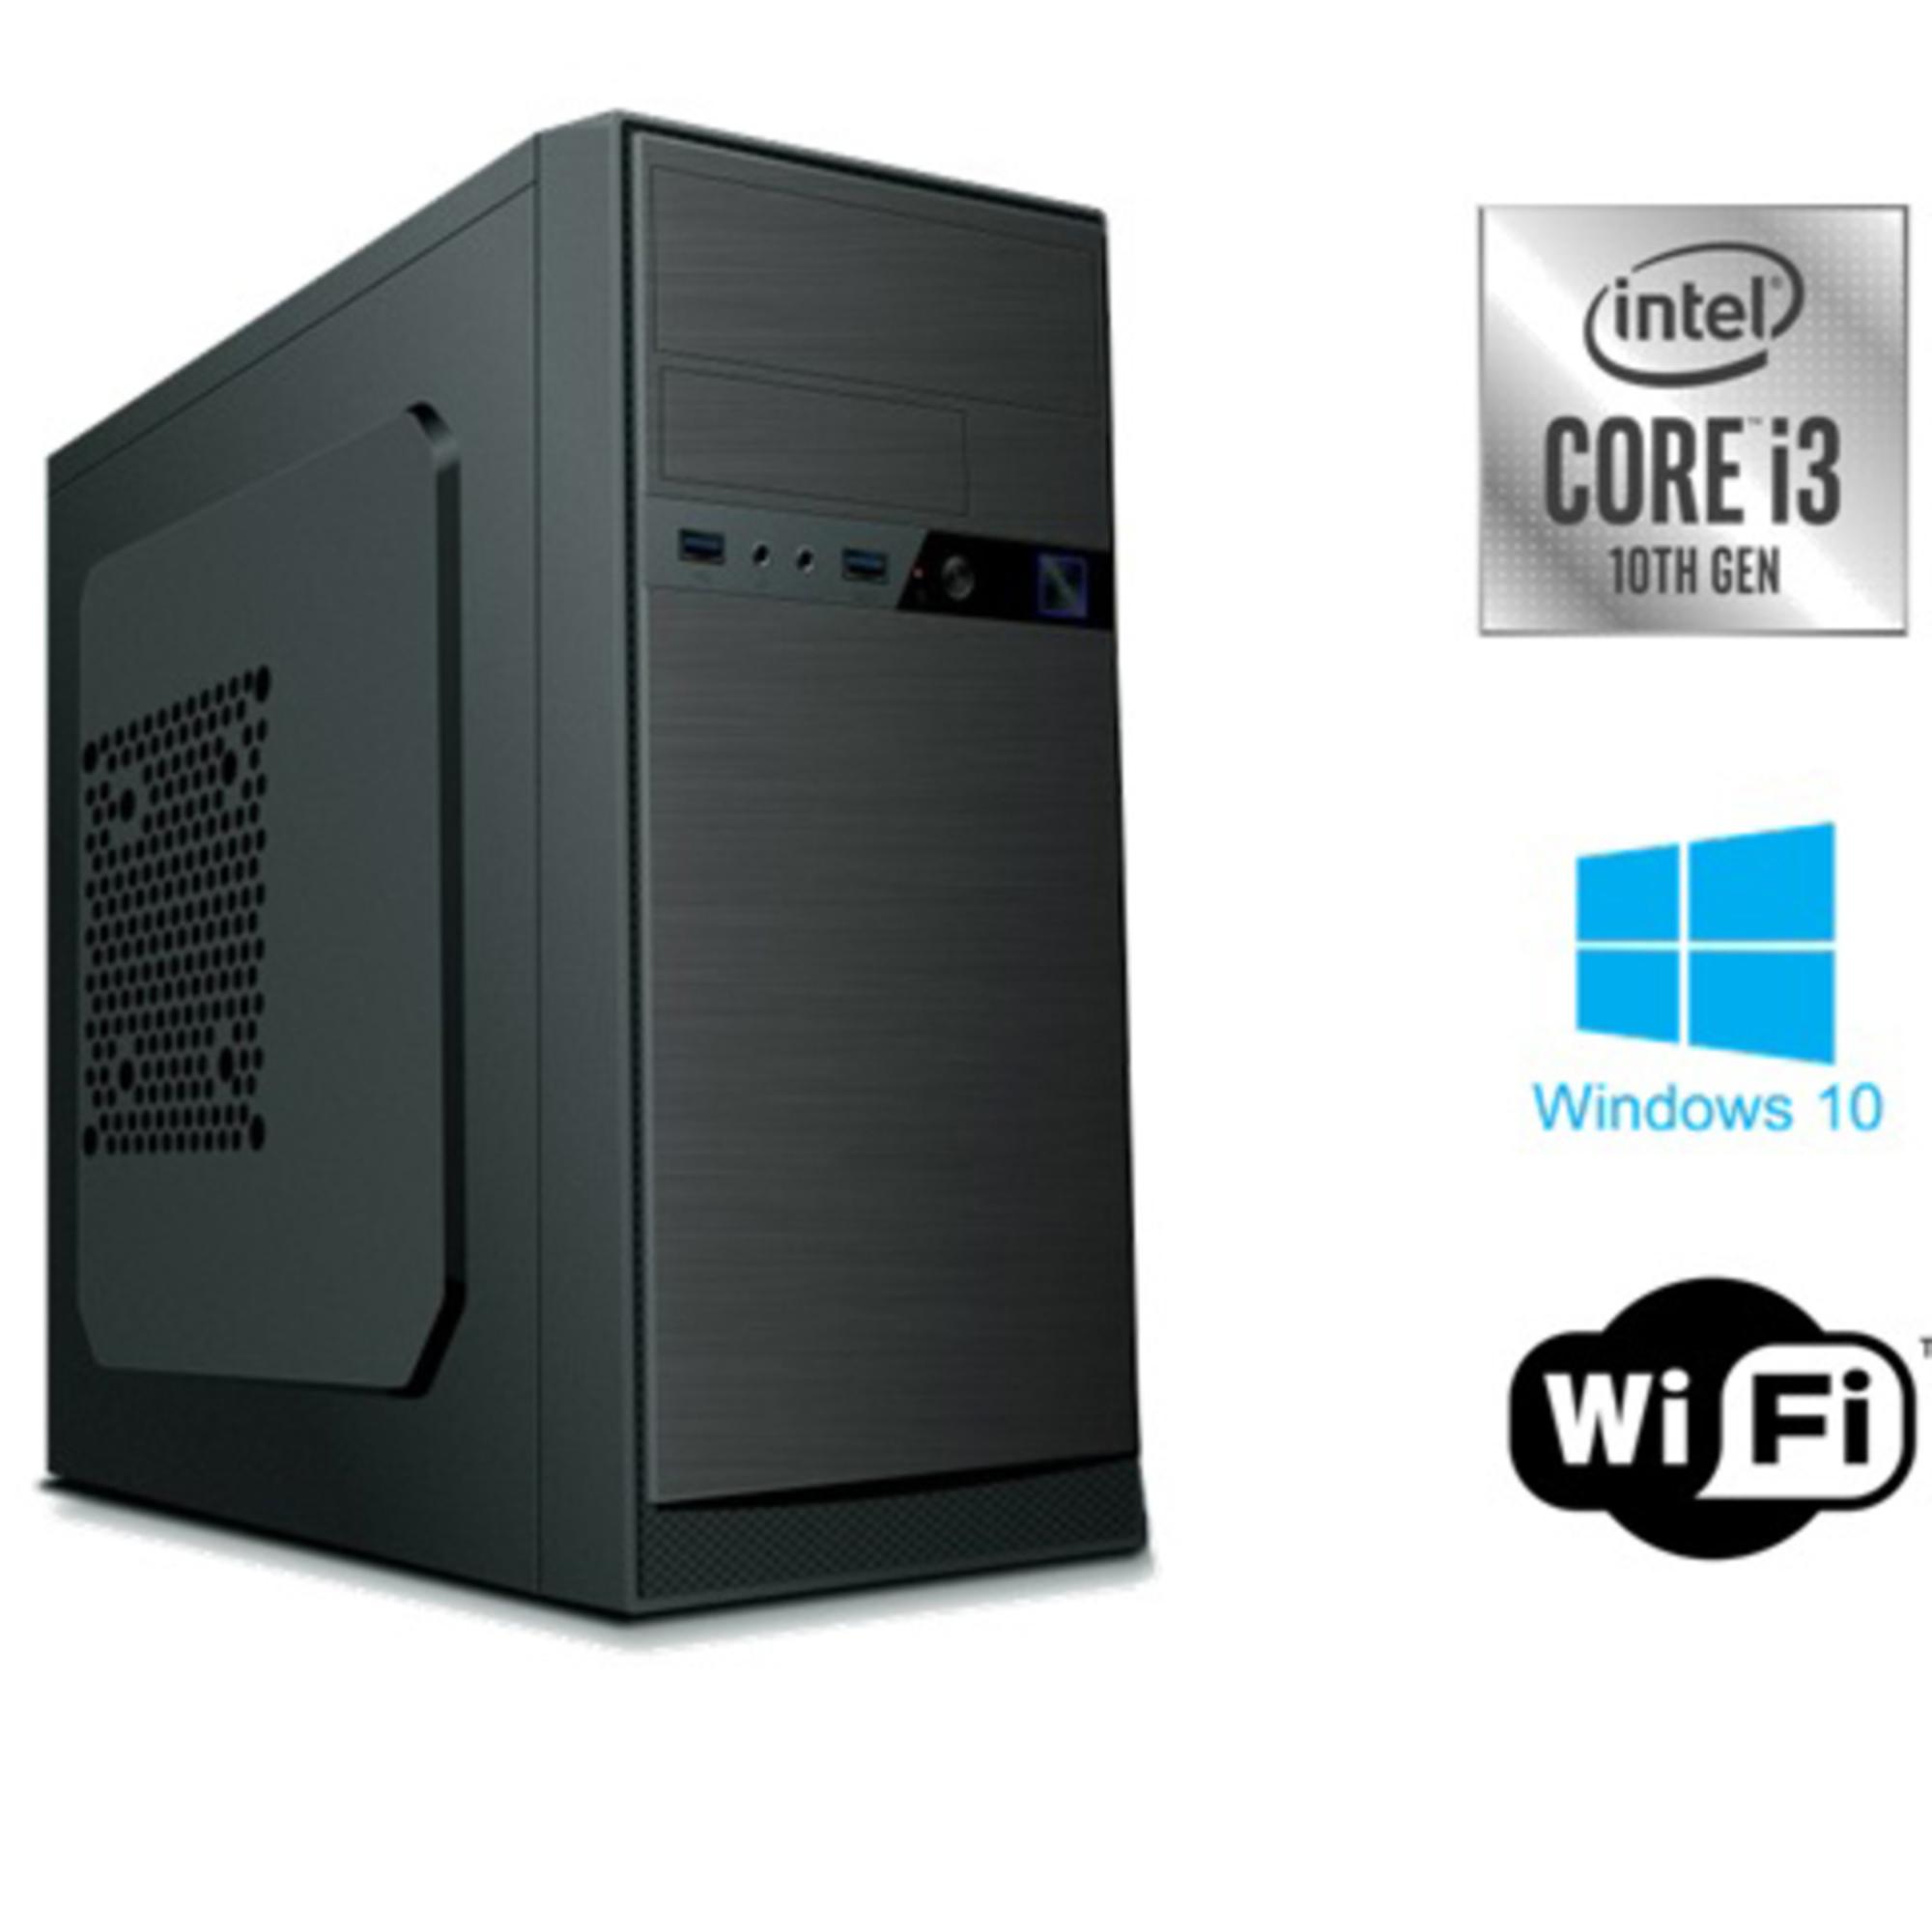 INSYS - INSYS Computador Desktop PowerNet, Intel® Core™ i3-10100, 8 GB RAM, 1 TB HDD SATA, Preto